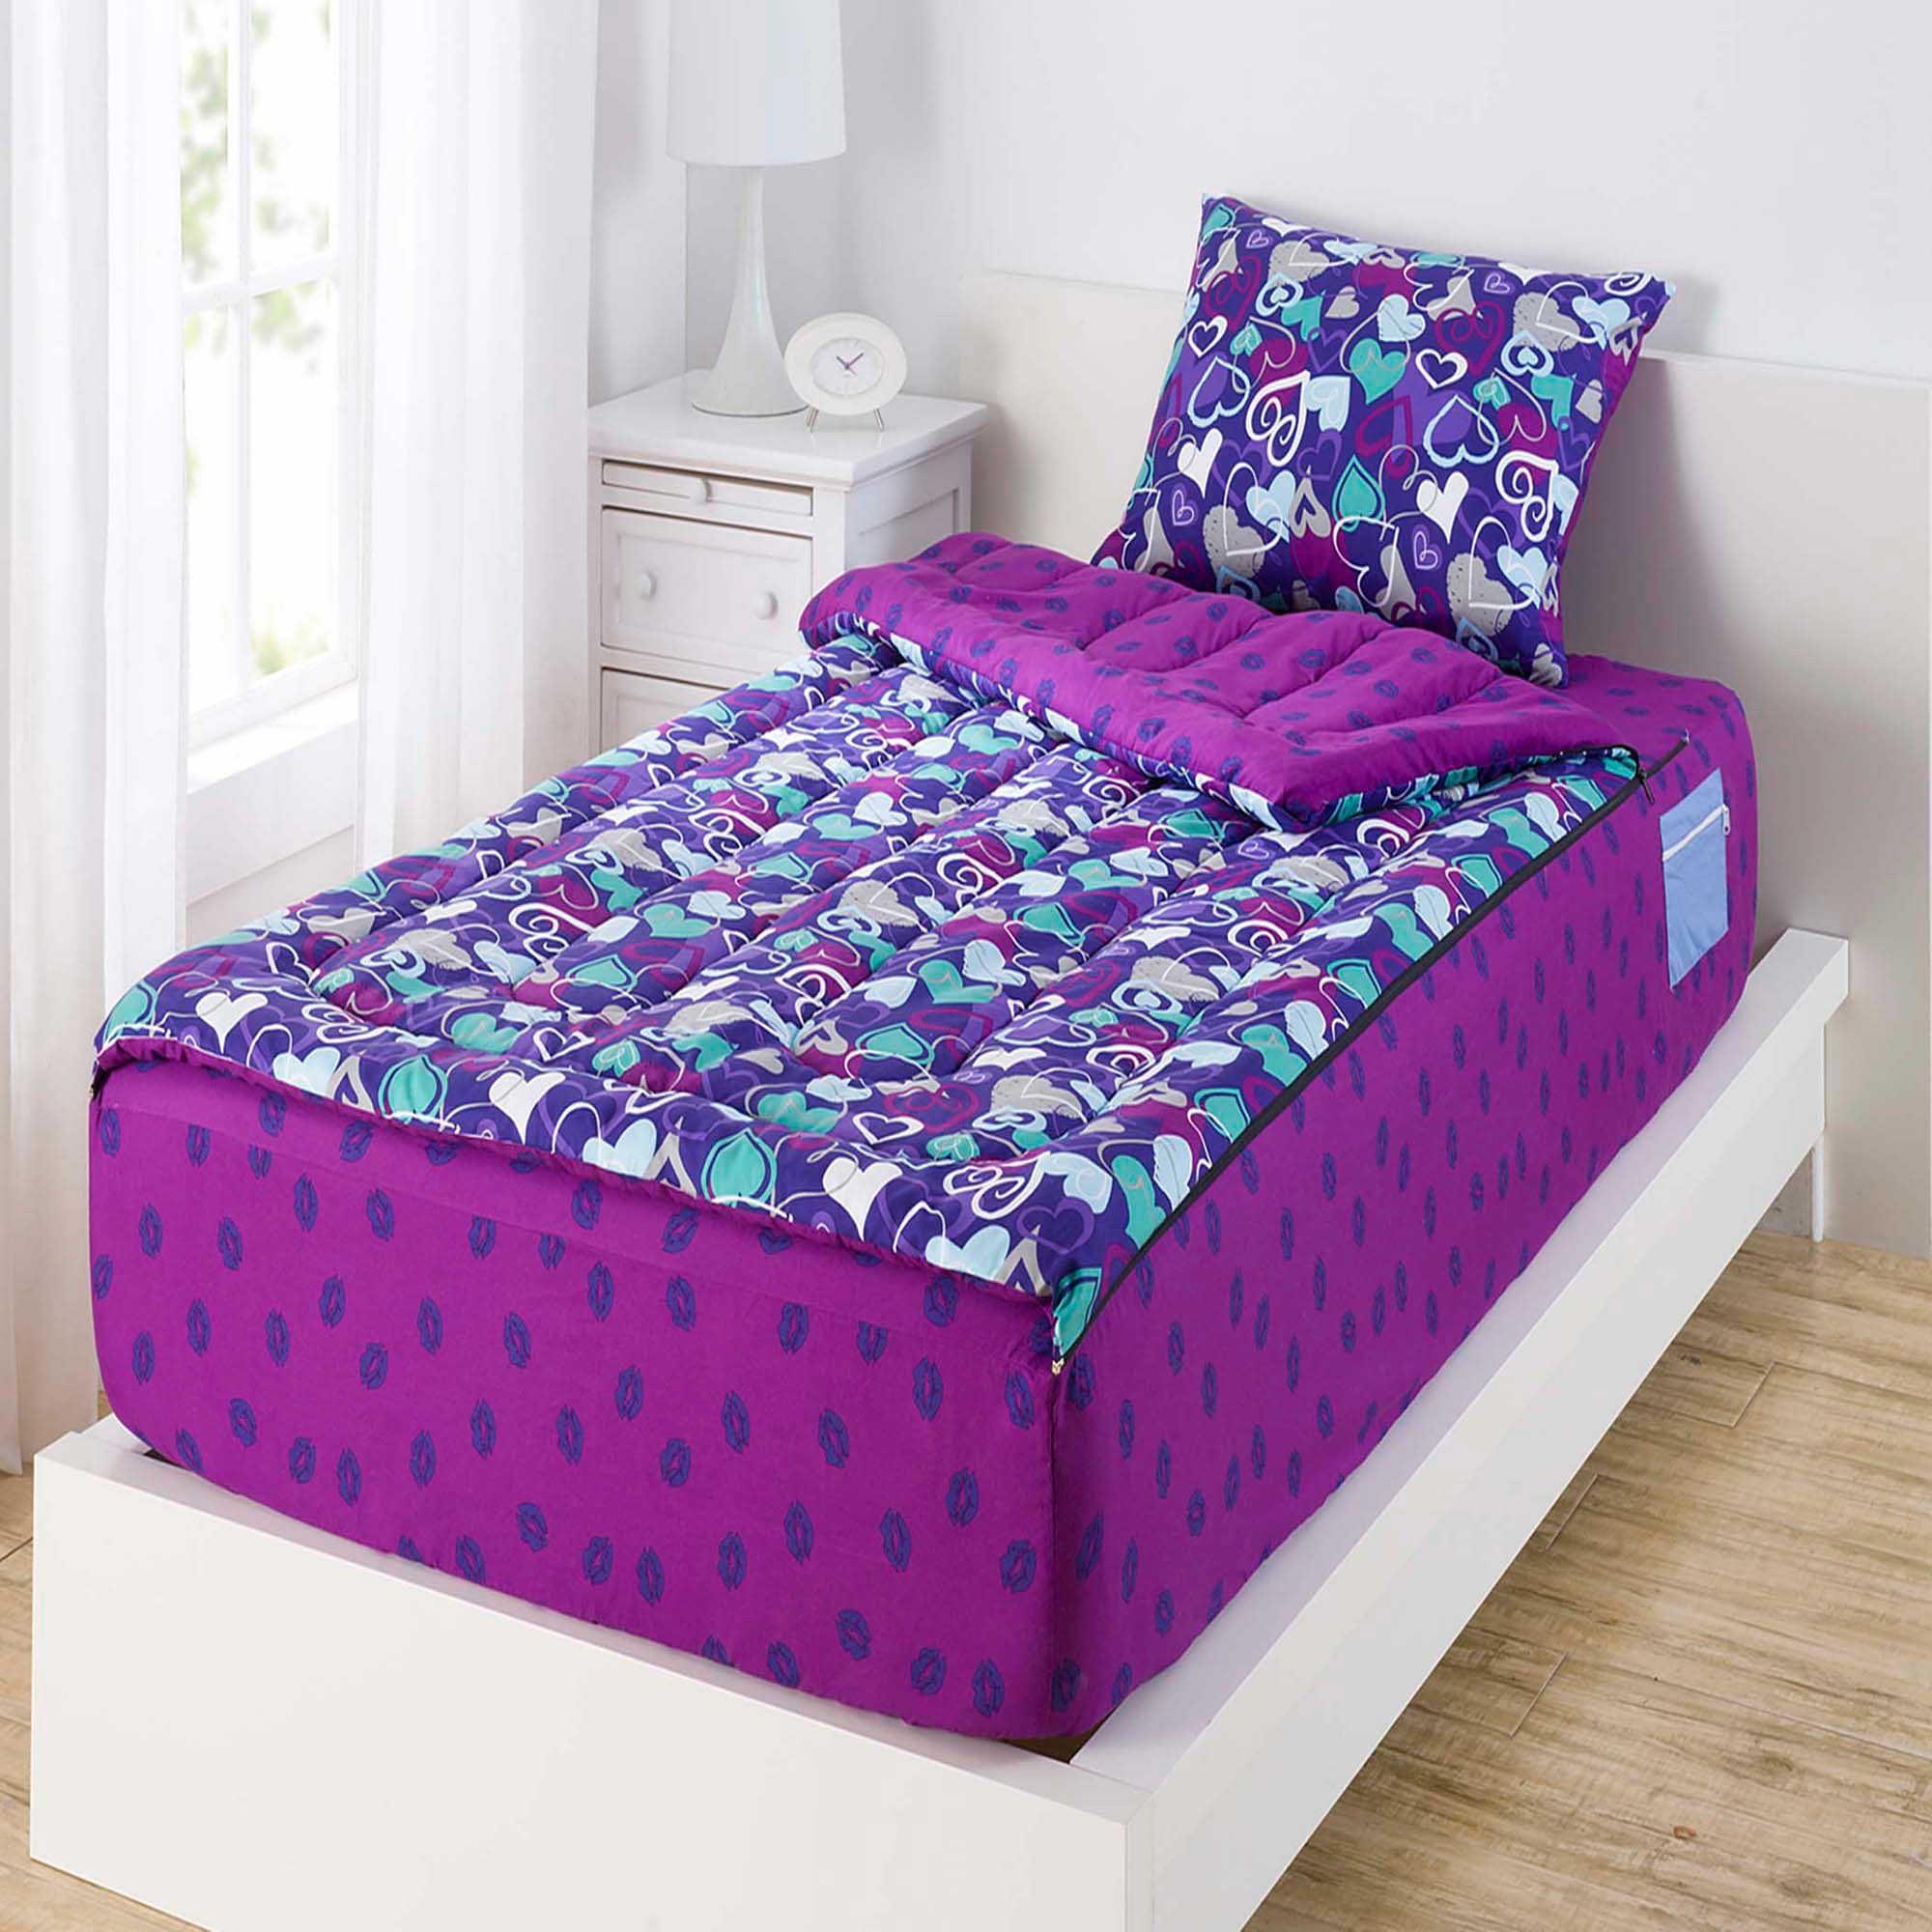 ZipIt Bedding® Hearts and Lips Reversible Twin Comforter